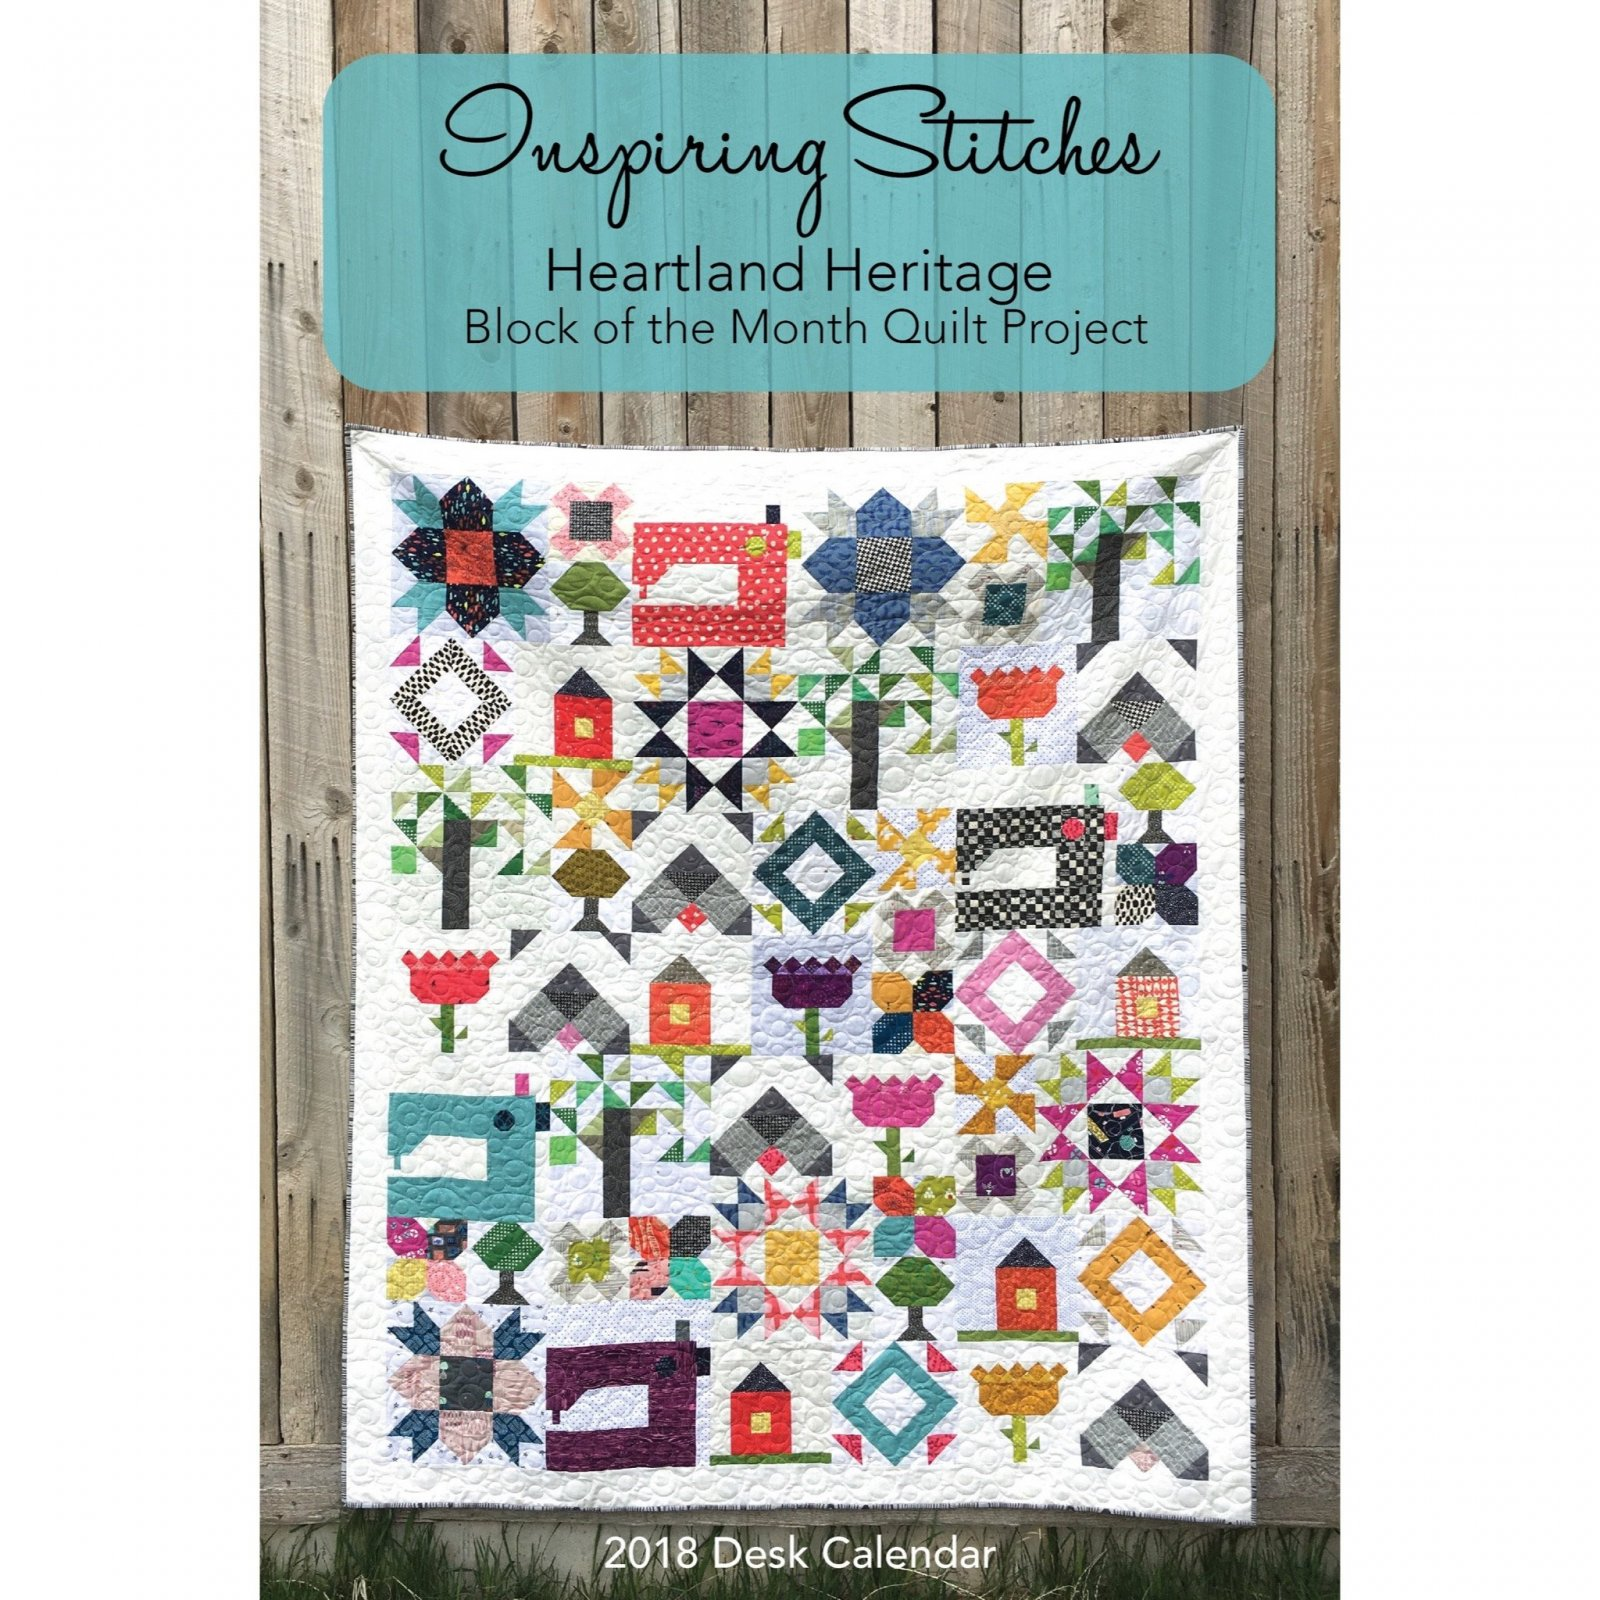 Heartland Heritage 2018 Desk Calendar